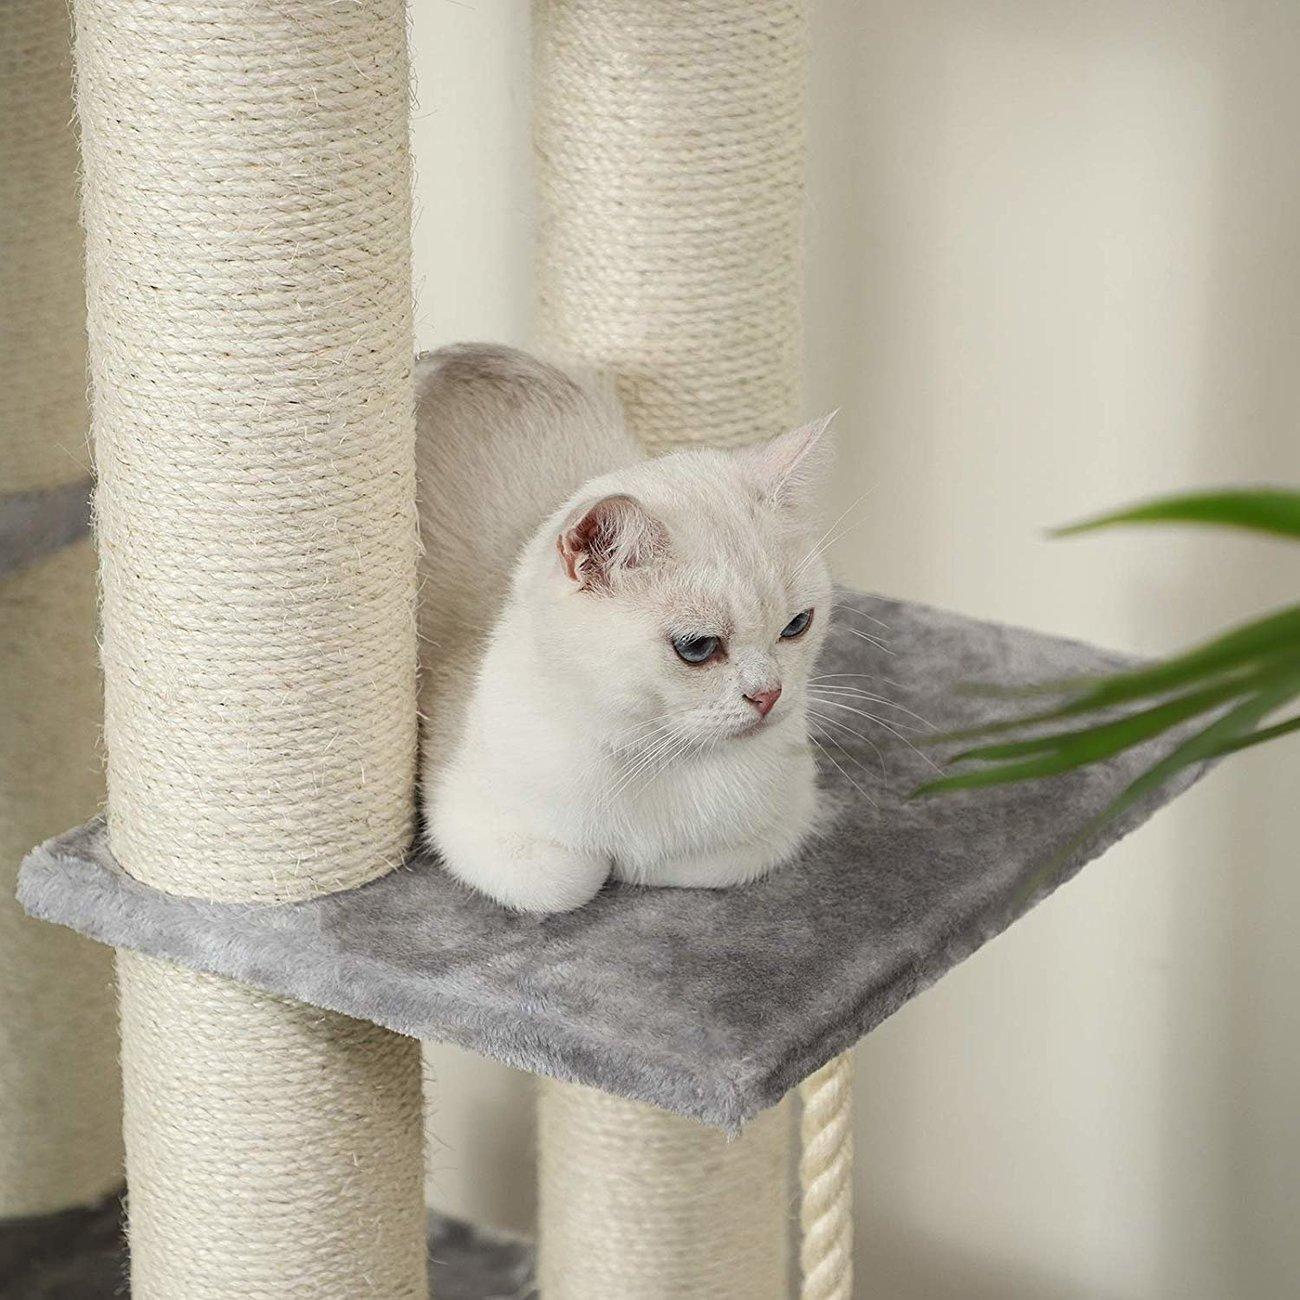 FEANDREA Katzen Kratzbaum mit Aussichtsplattform, Bild 8